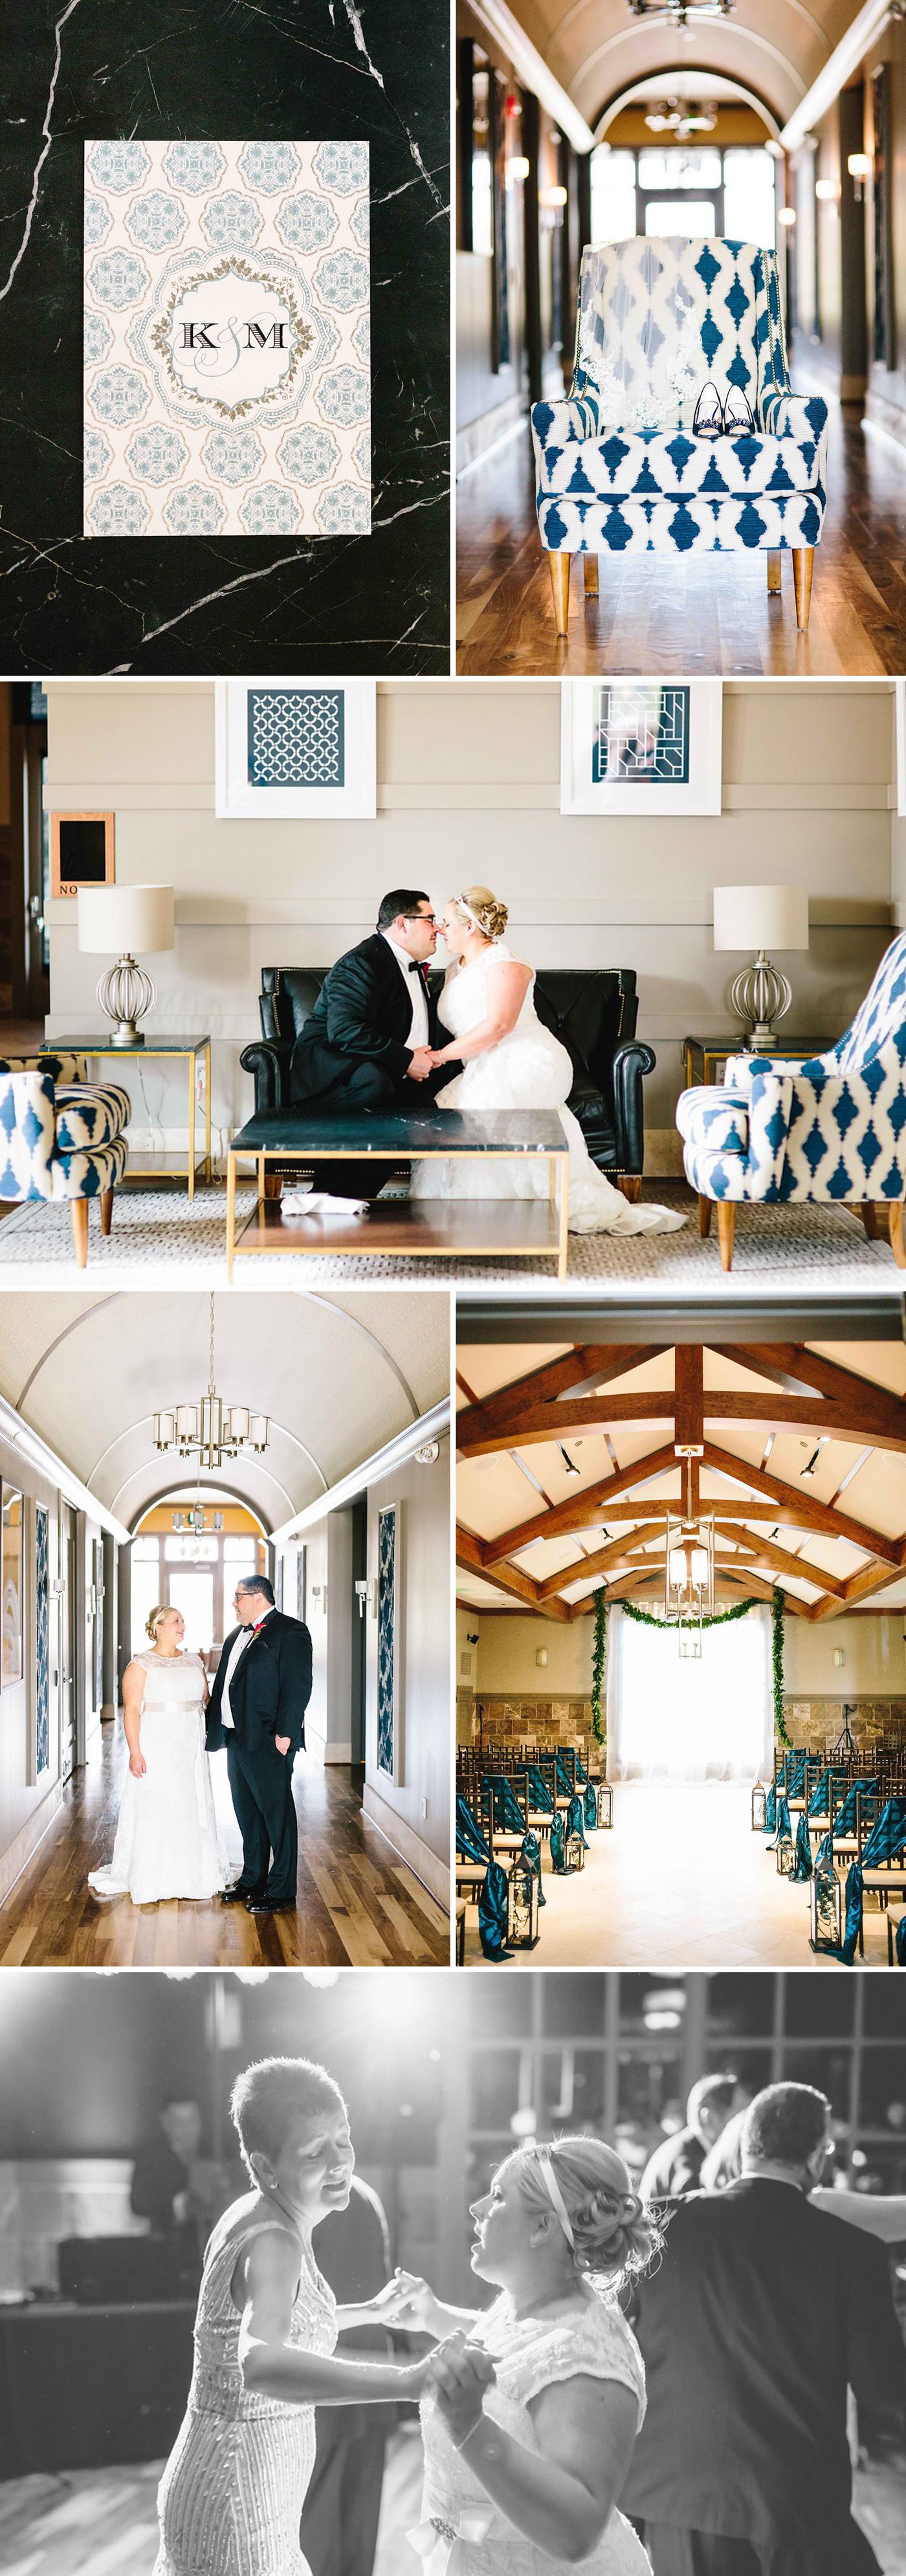 chicago-fine-art-wedding-photography-virgilio